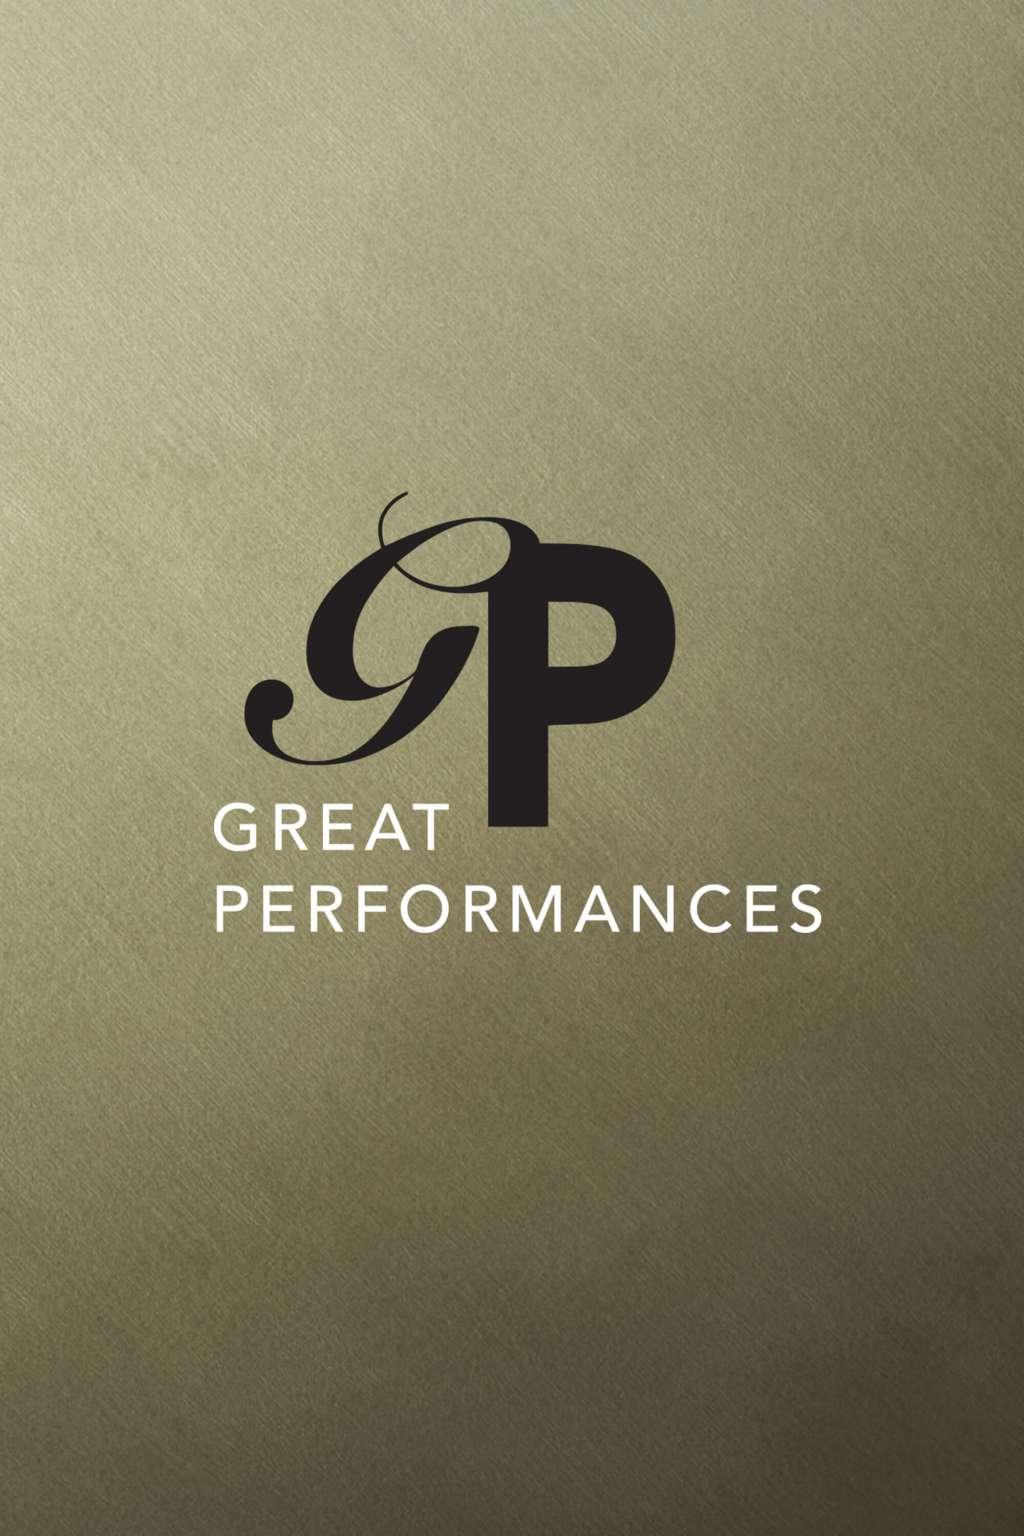 Great Performances kapak